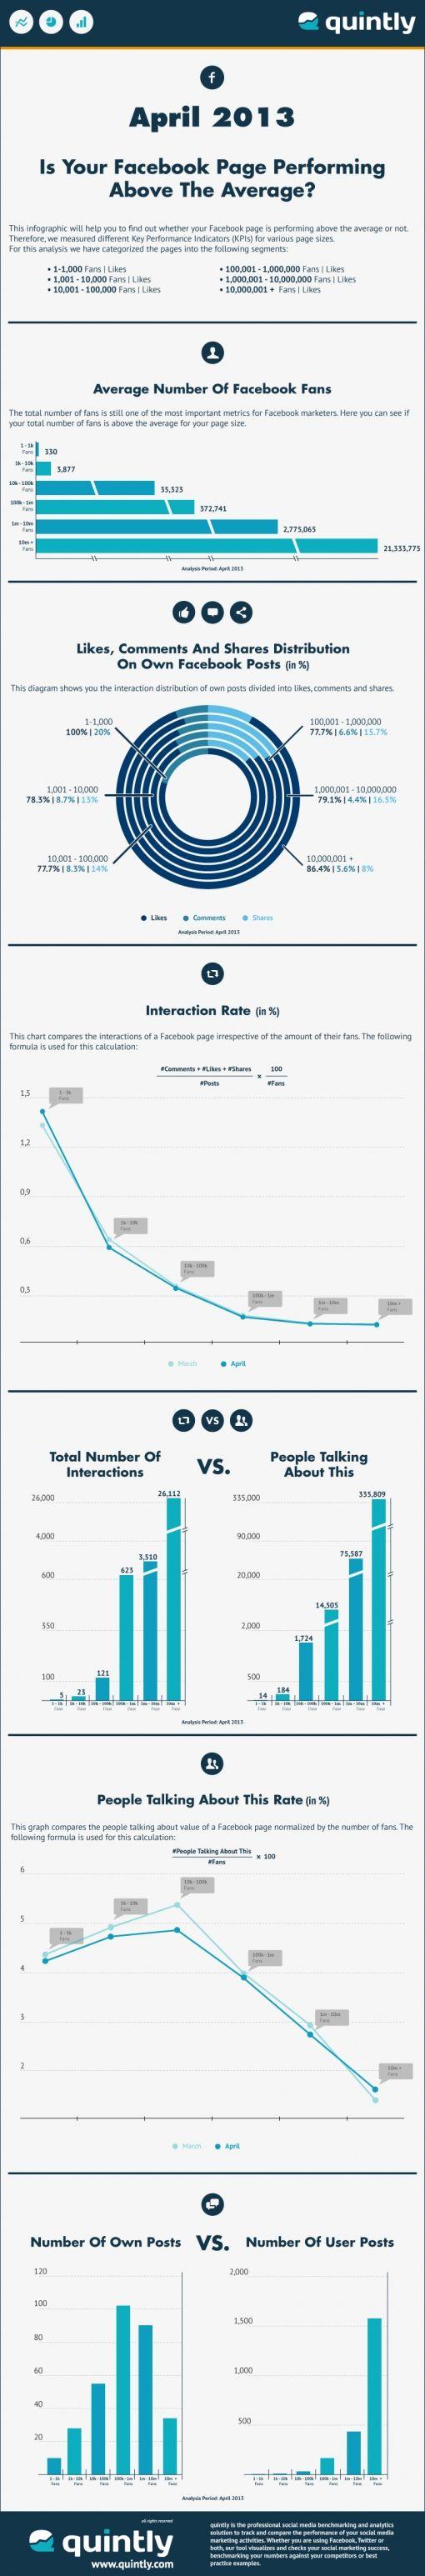 average_FB_page_performance_april